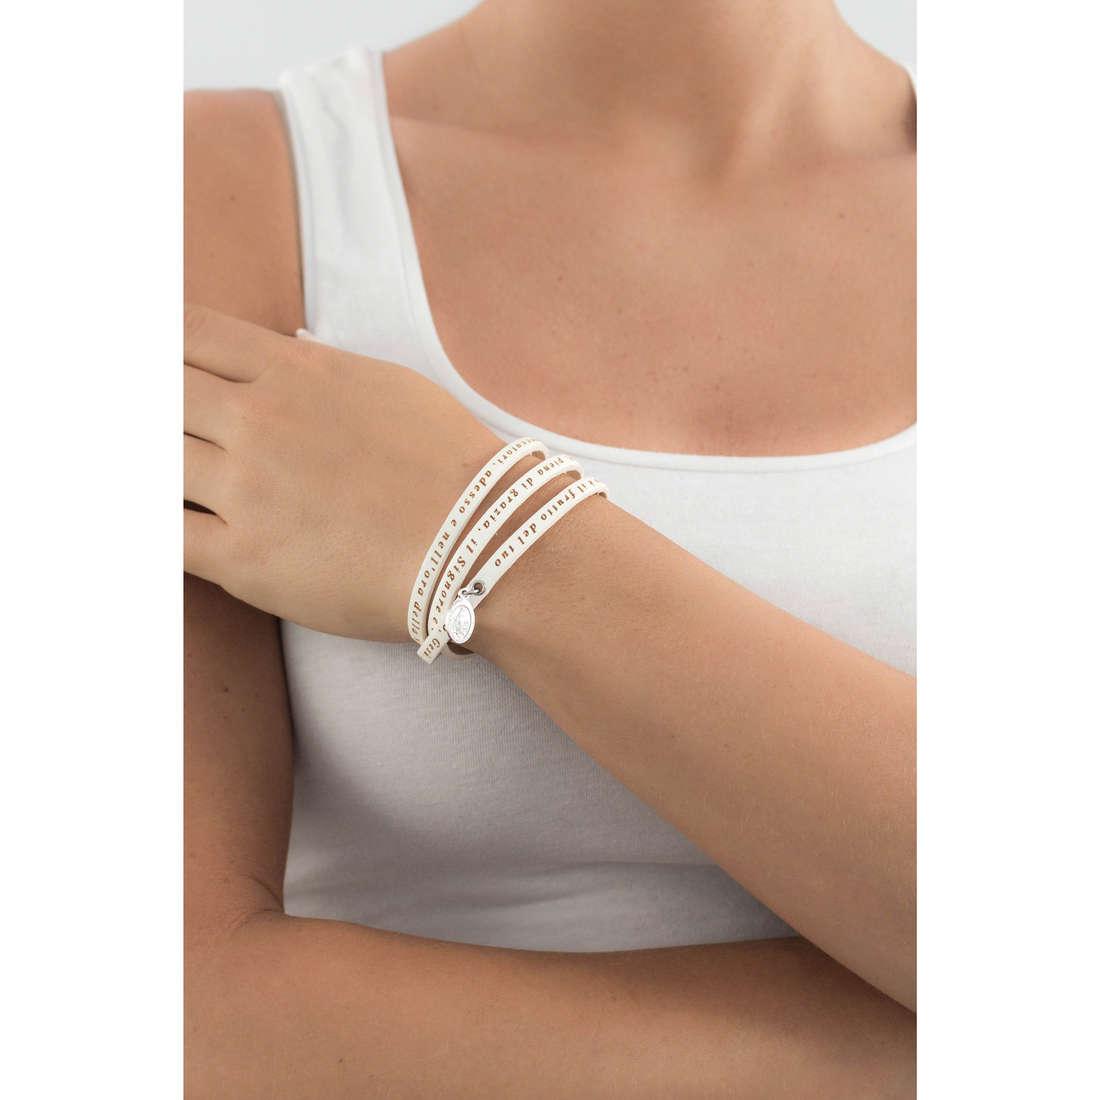 Amen bracelets Ave Maria Italiano woman AC-AMIT07-M-57 indosso